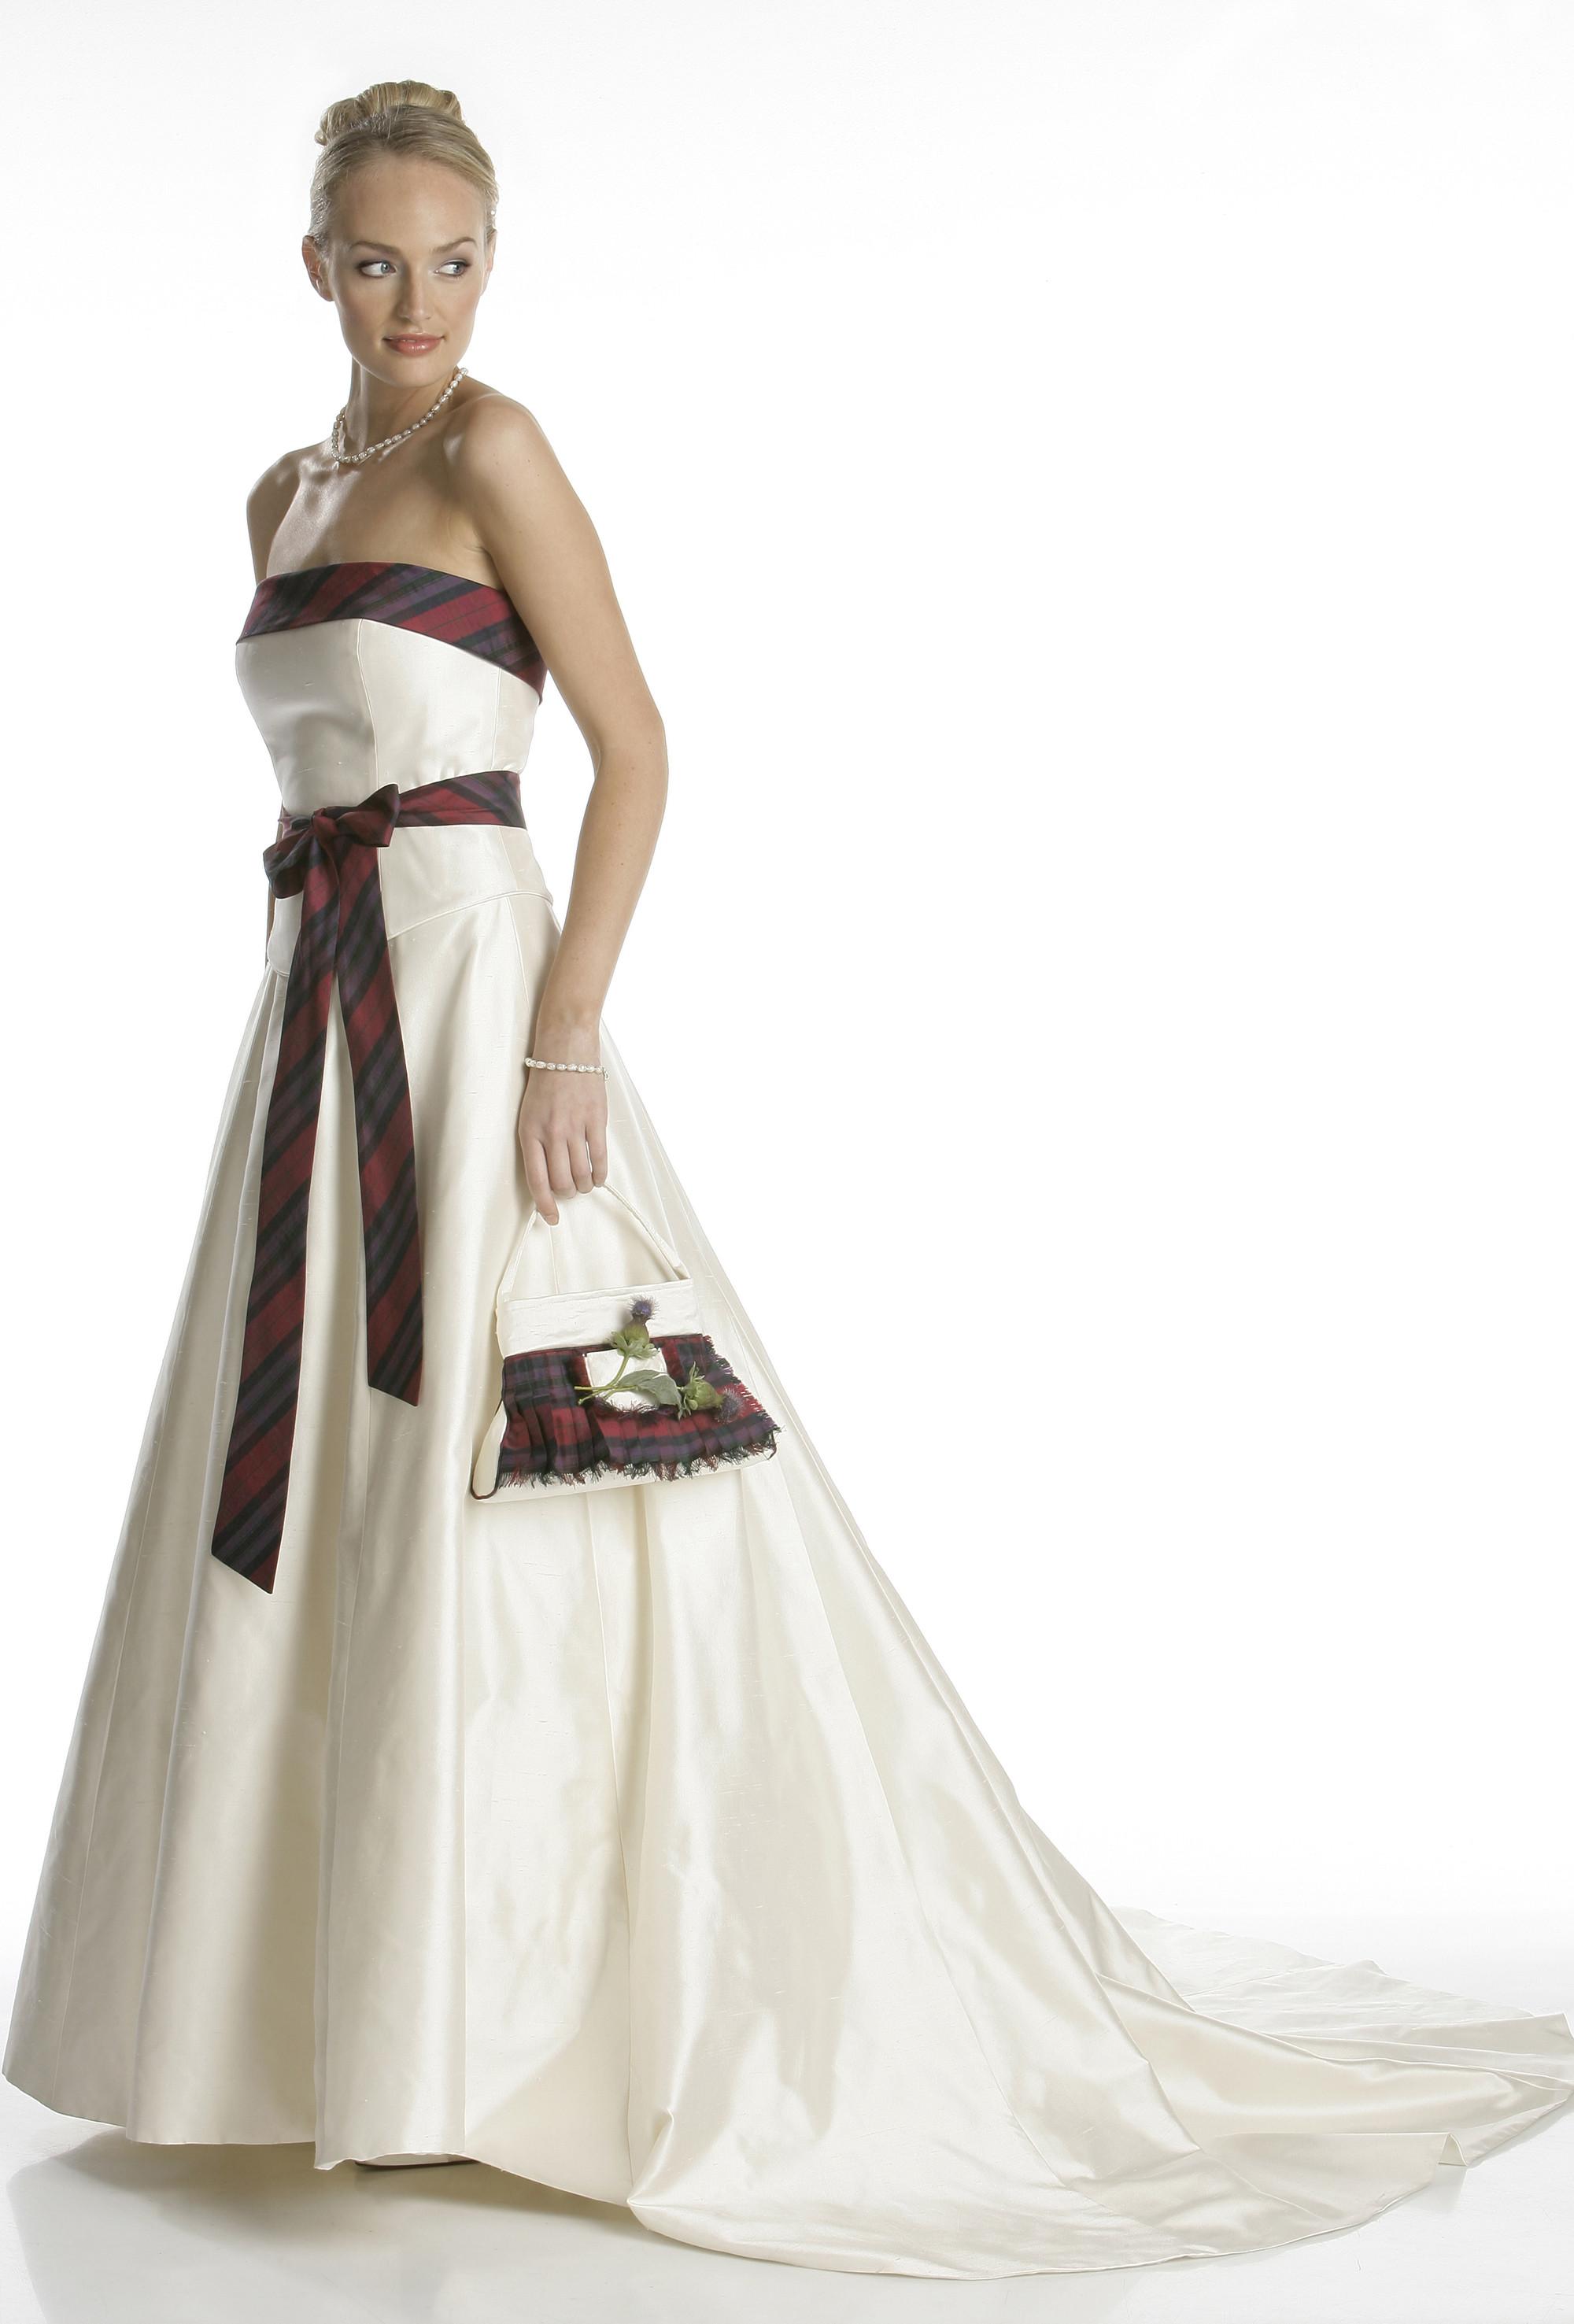 Glasgow bridesmaid dresses best ideas dress glasgow bridesmaid dresses hd image ombrellifo Images